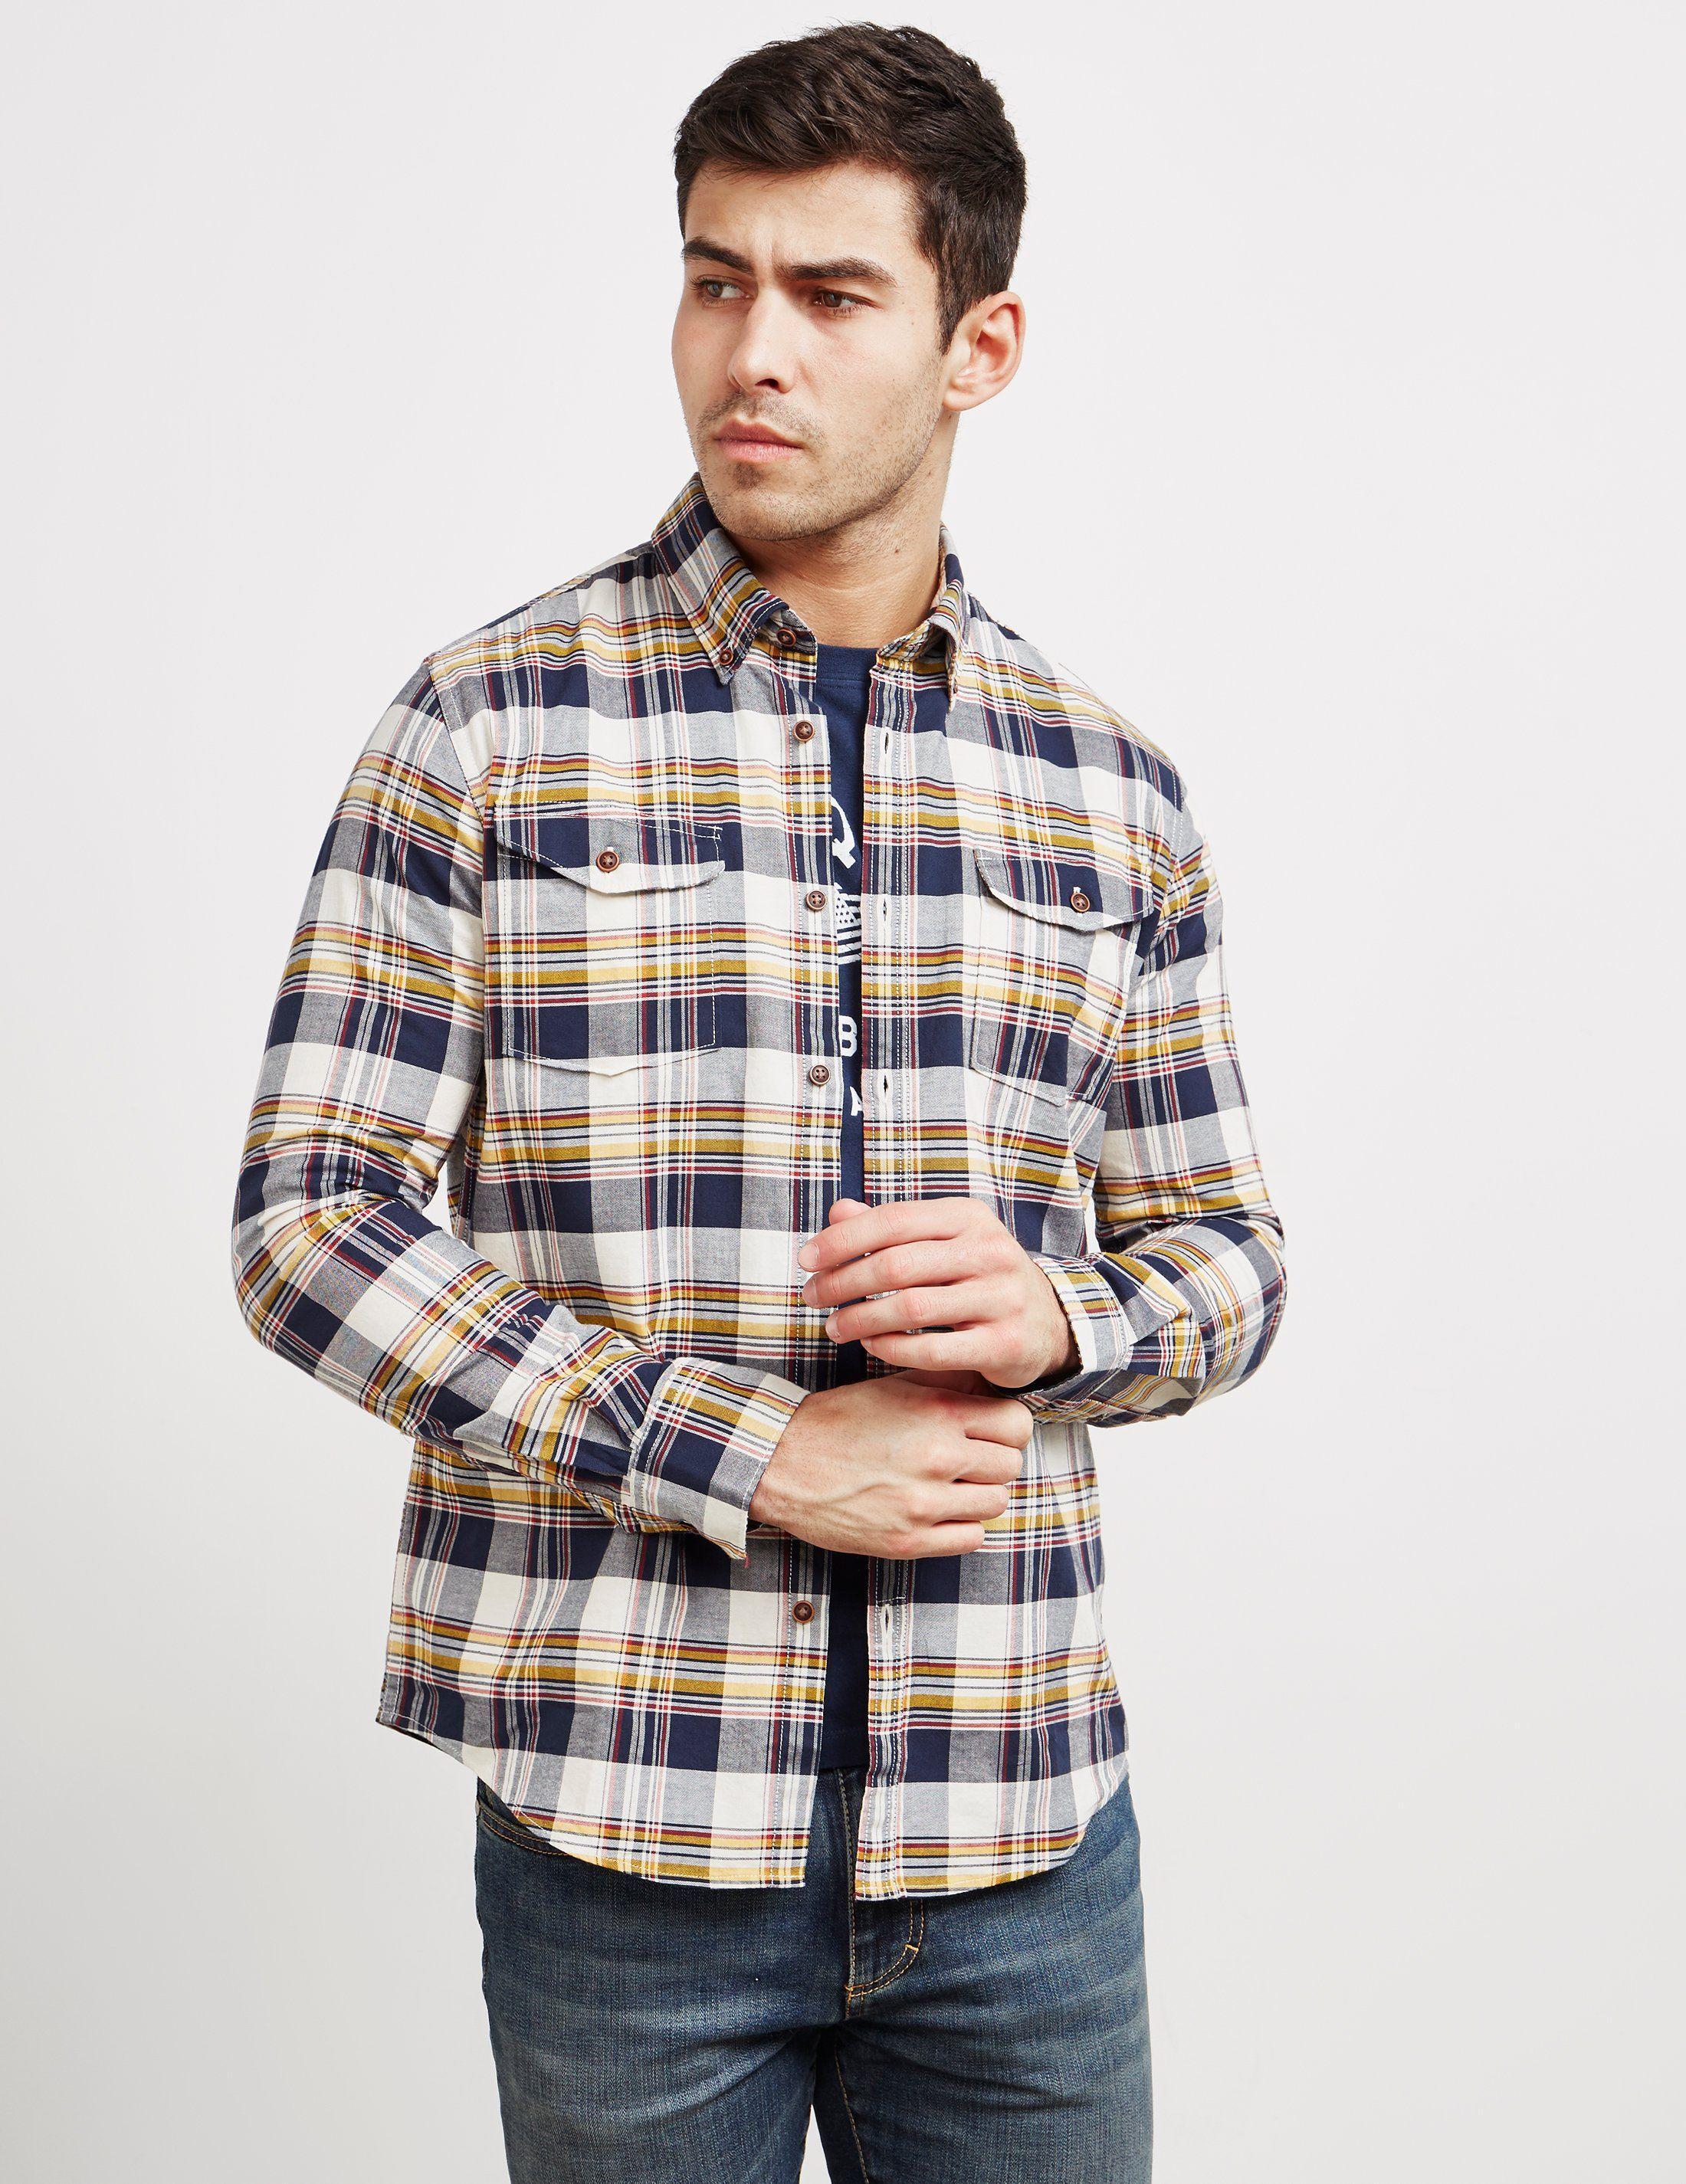 Barbour International Steve McQueen Long Sleeve King Shirt